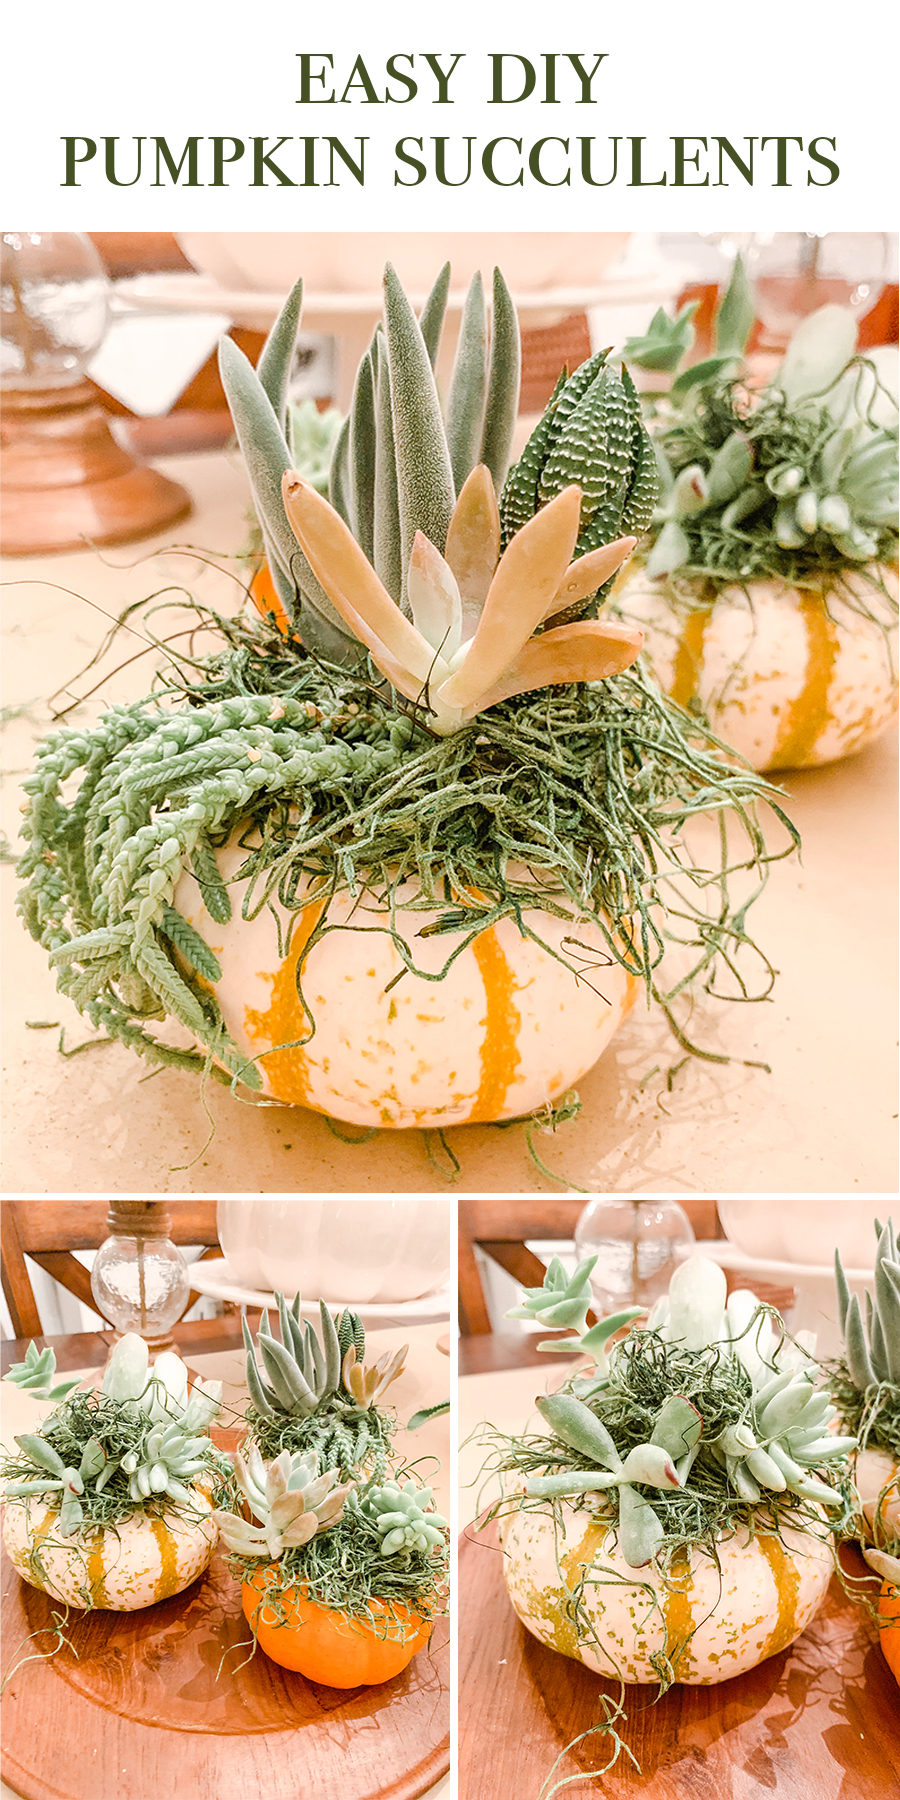 Easy DIY Pumpkin Succulents